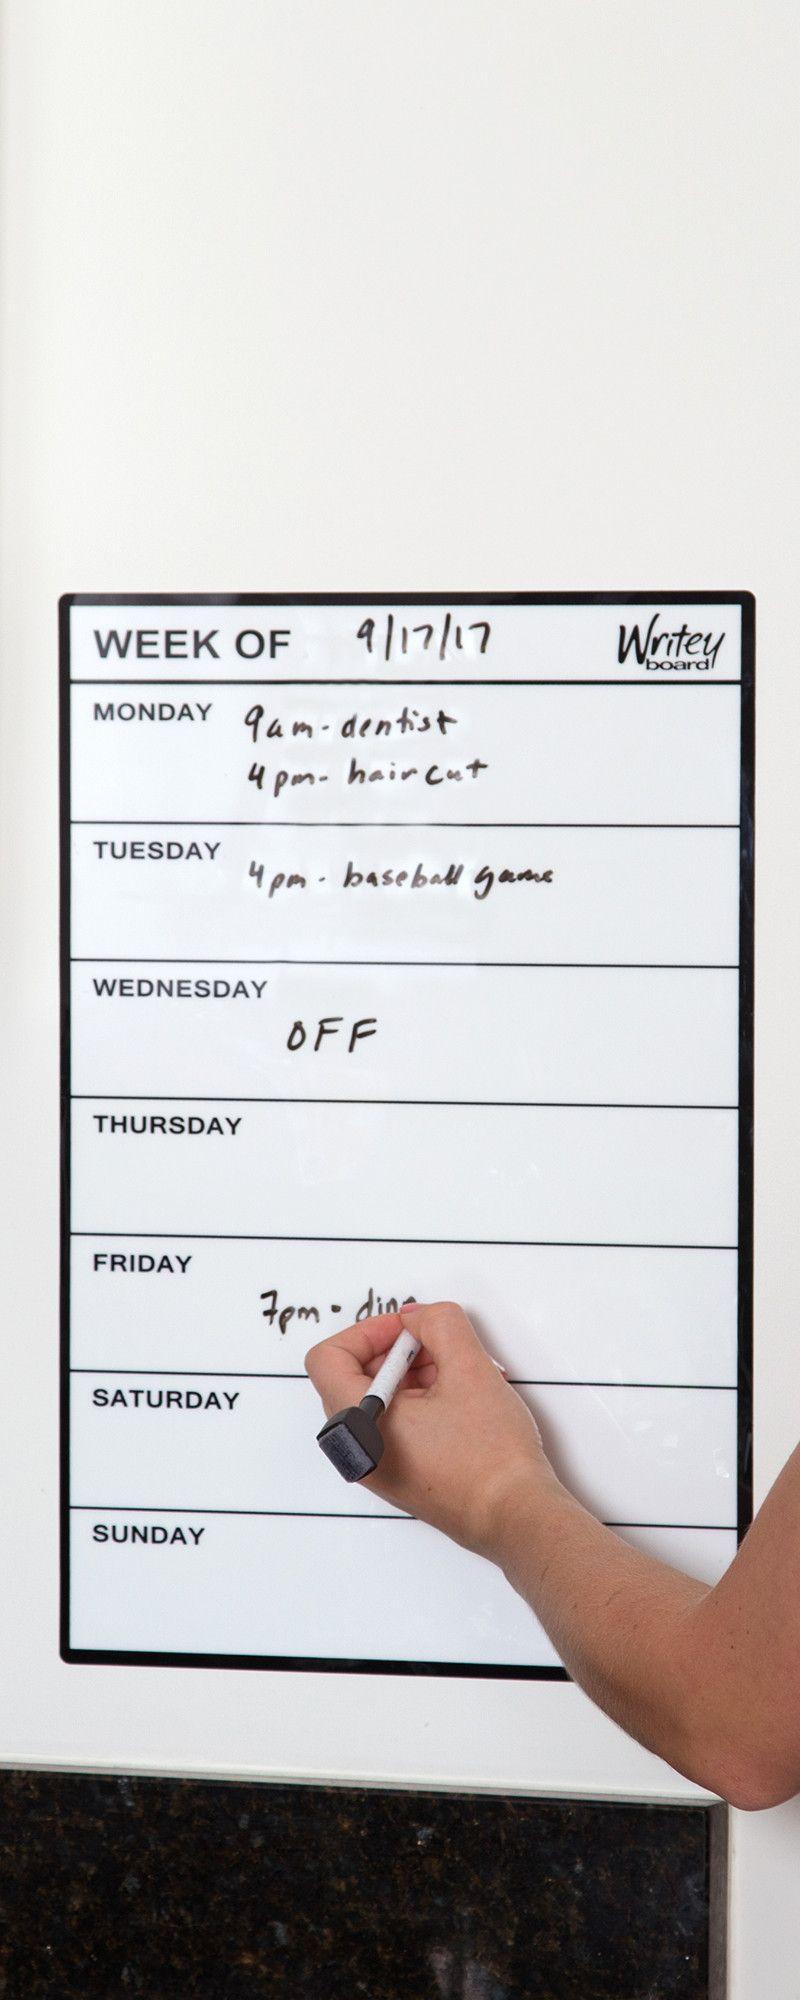 WriteyBoard Whiteboard Notepad